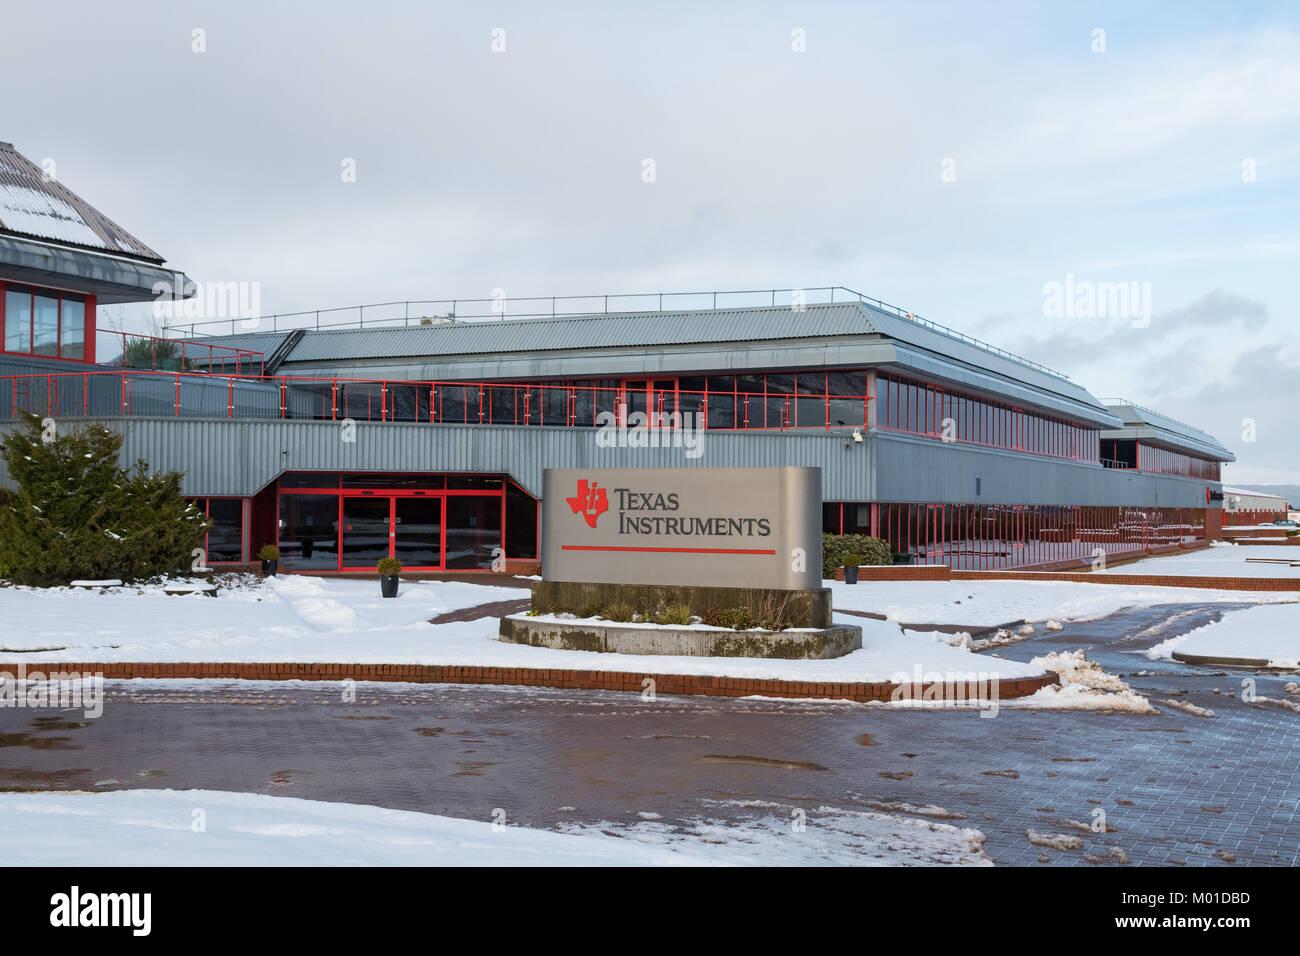 Usine de semi-conducteurs Texas Instruments, Gourock, Greenock, Scotland, UK Photo Stock